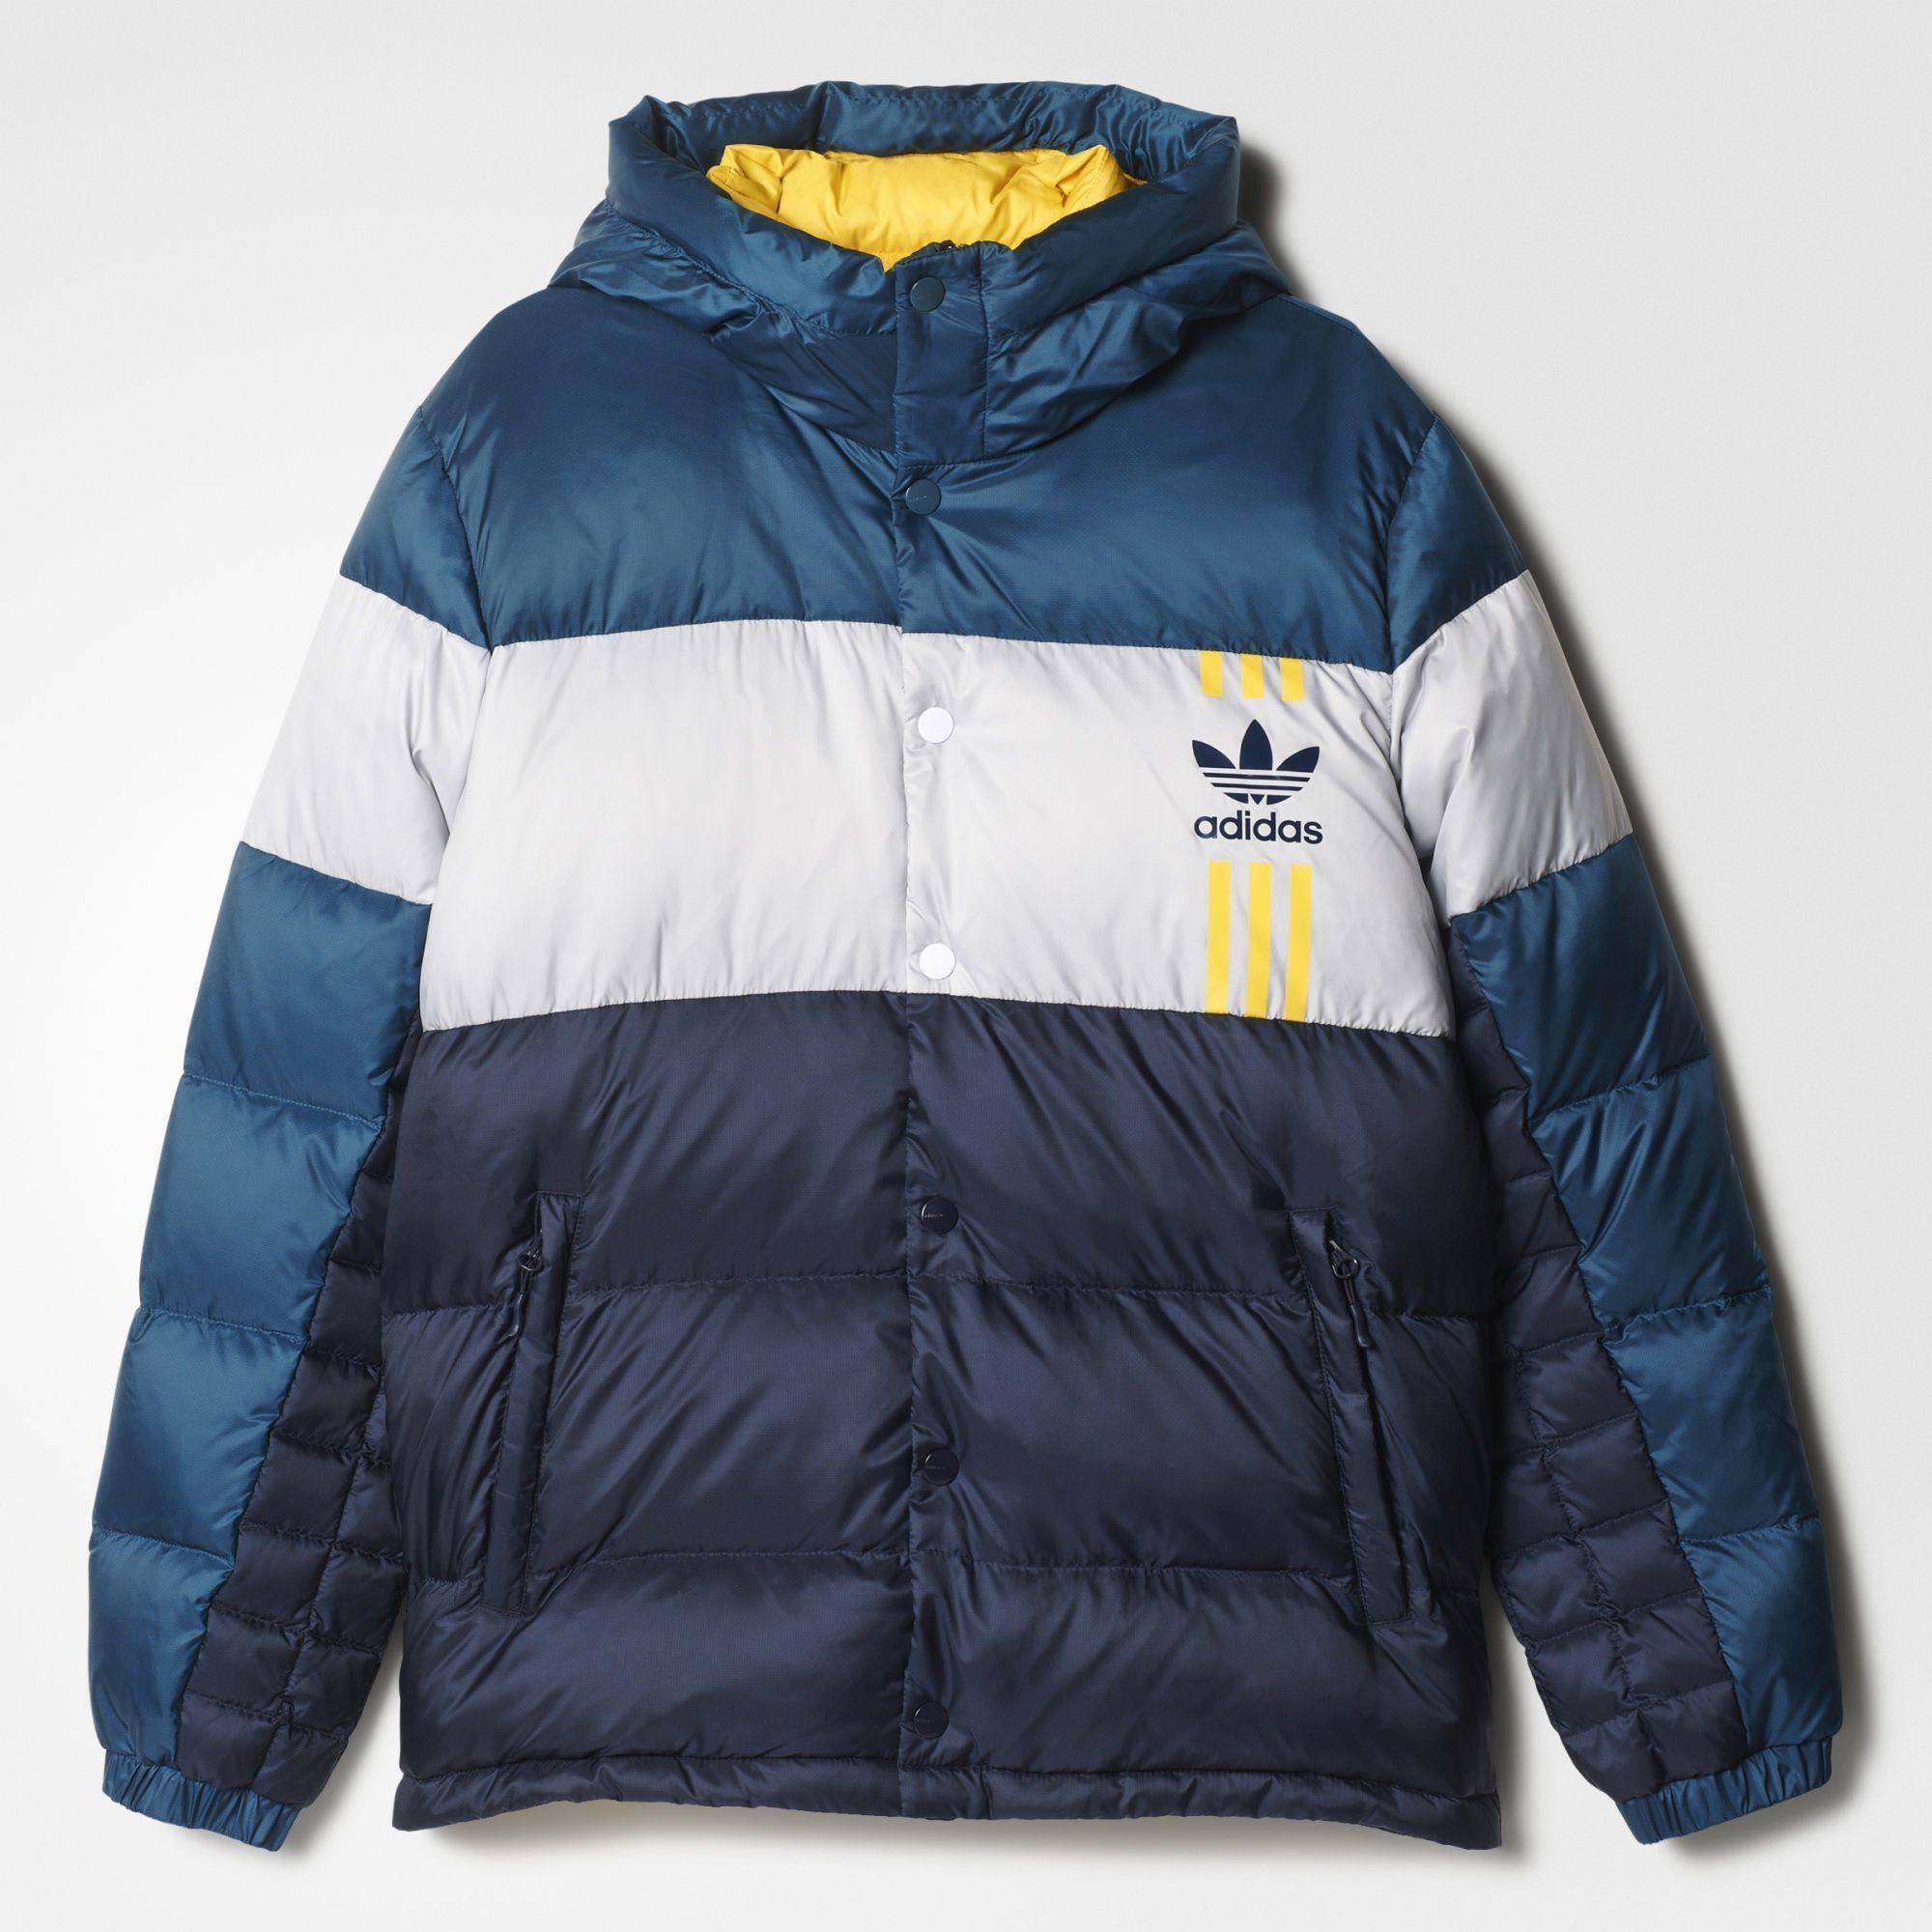 Chaqueta ID96 Down | Adidas chaqueta, Chaquetas, Adidas